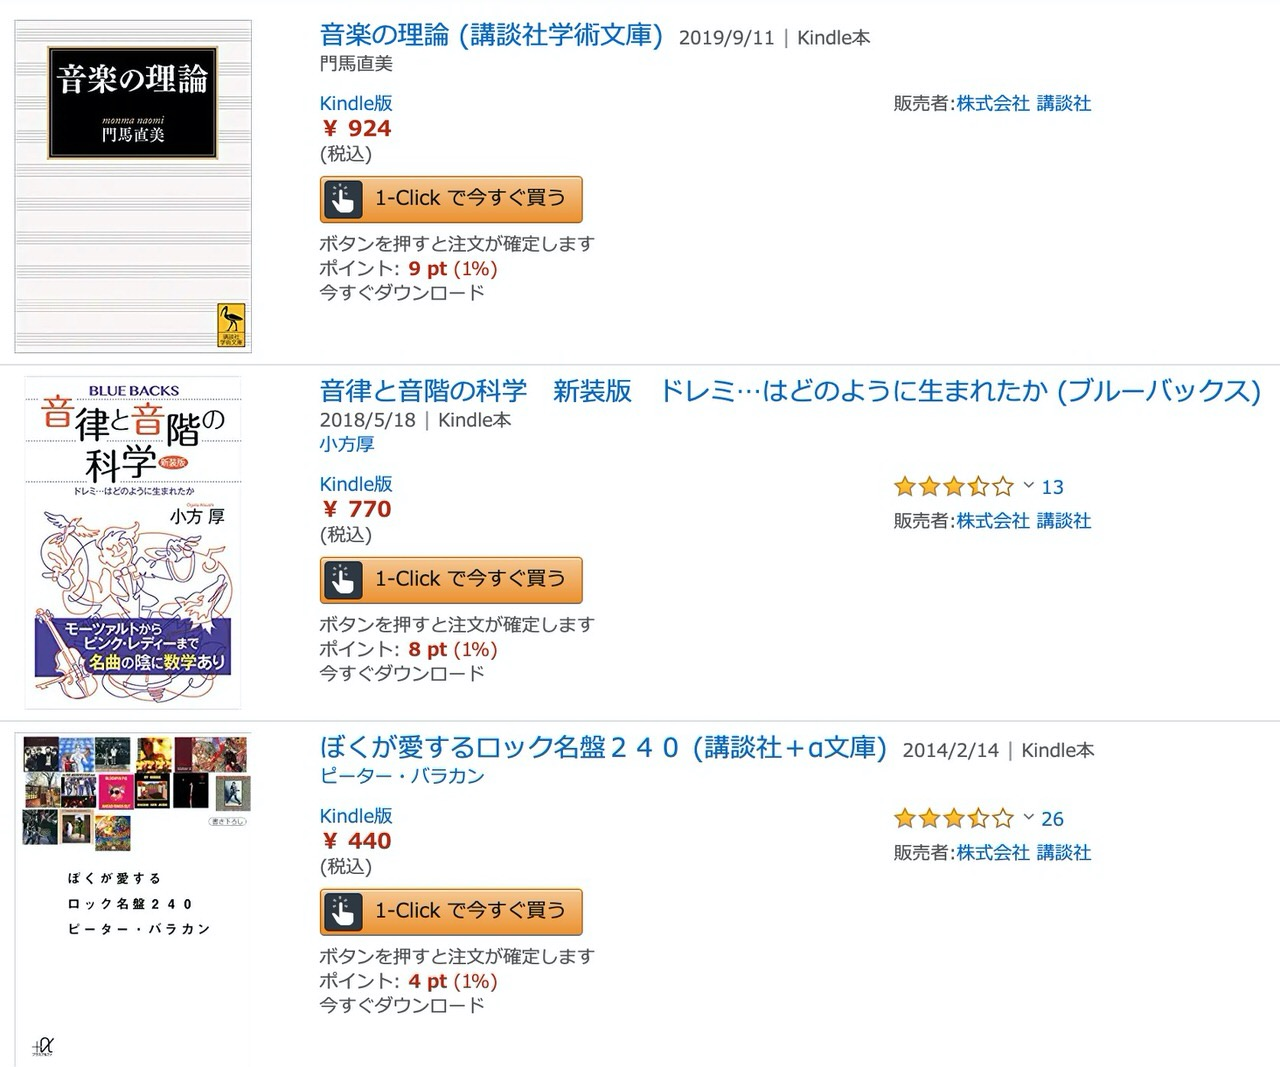 【Kindleセール】ぼくが愛するロック名盤240、音律と音階の科学など「ミュージック本フェア」(10/24まで)